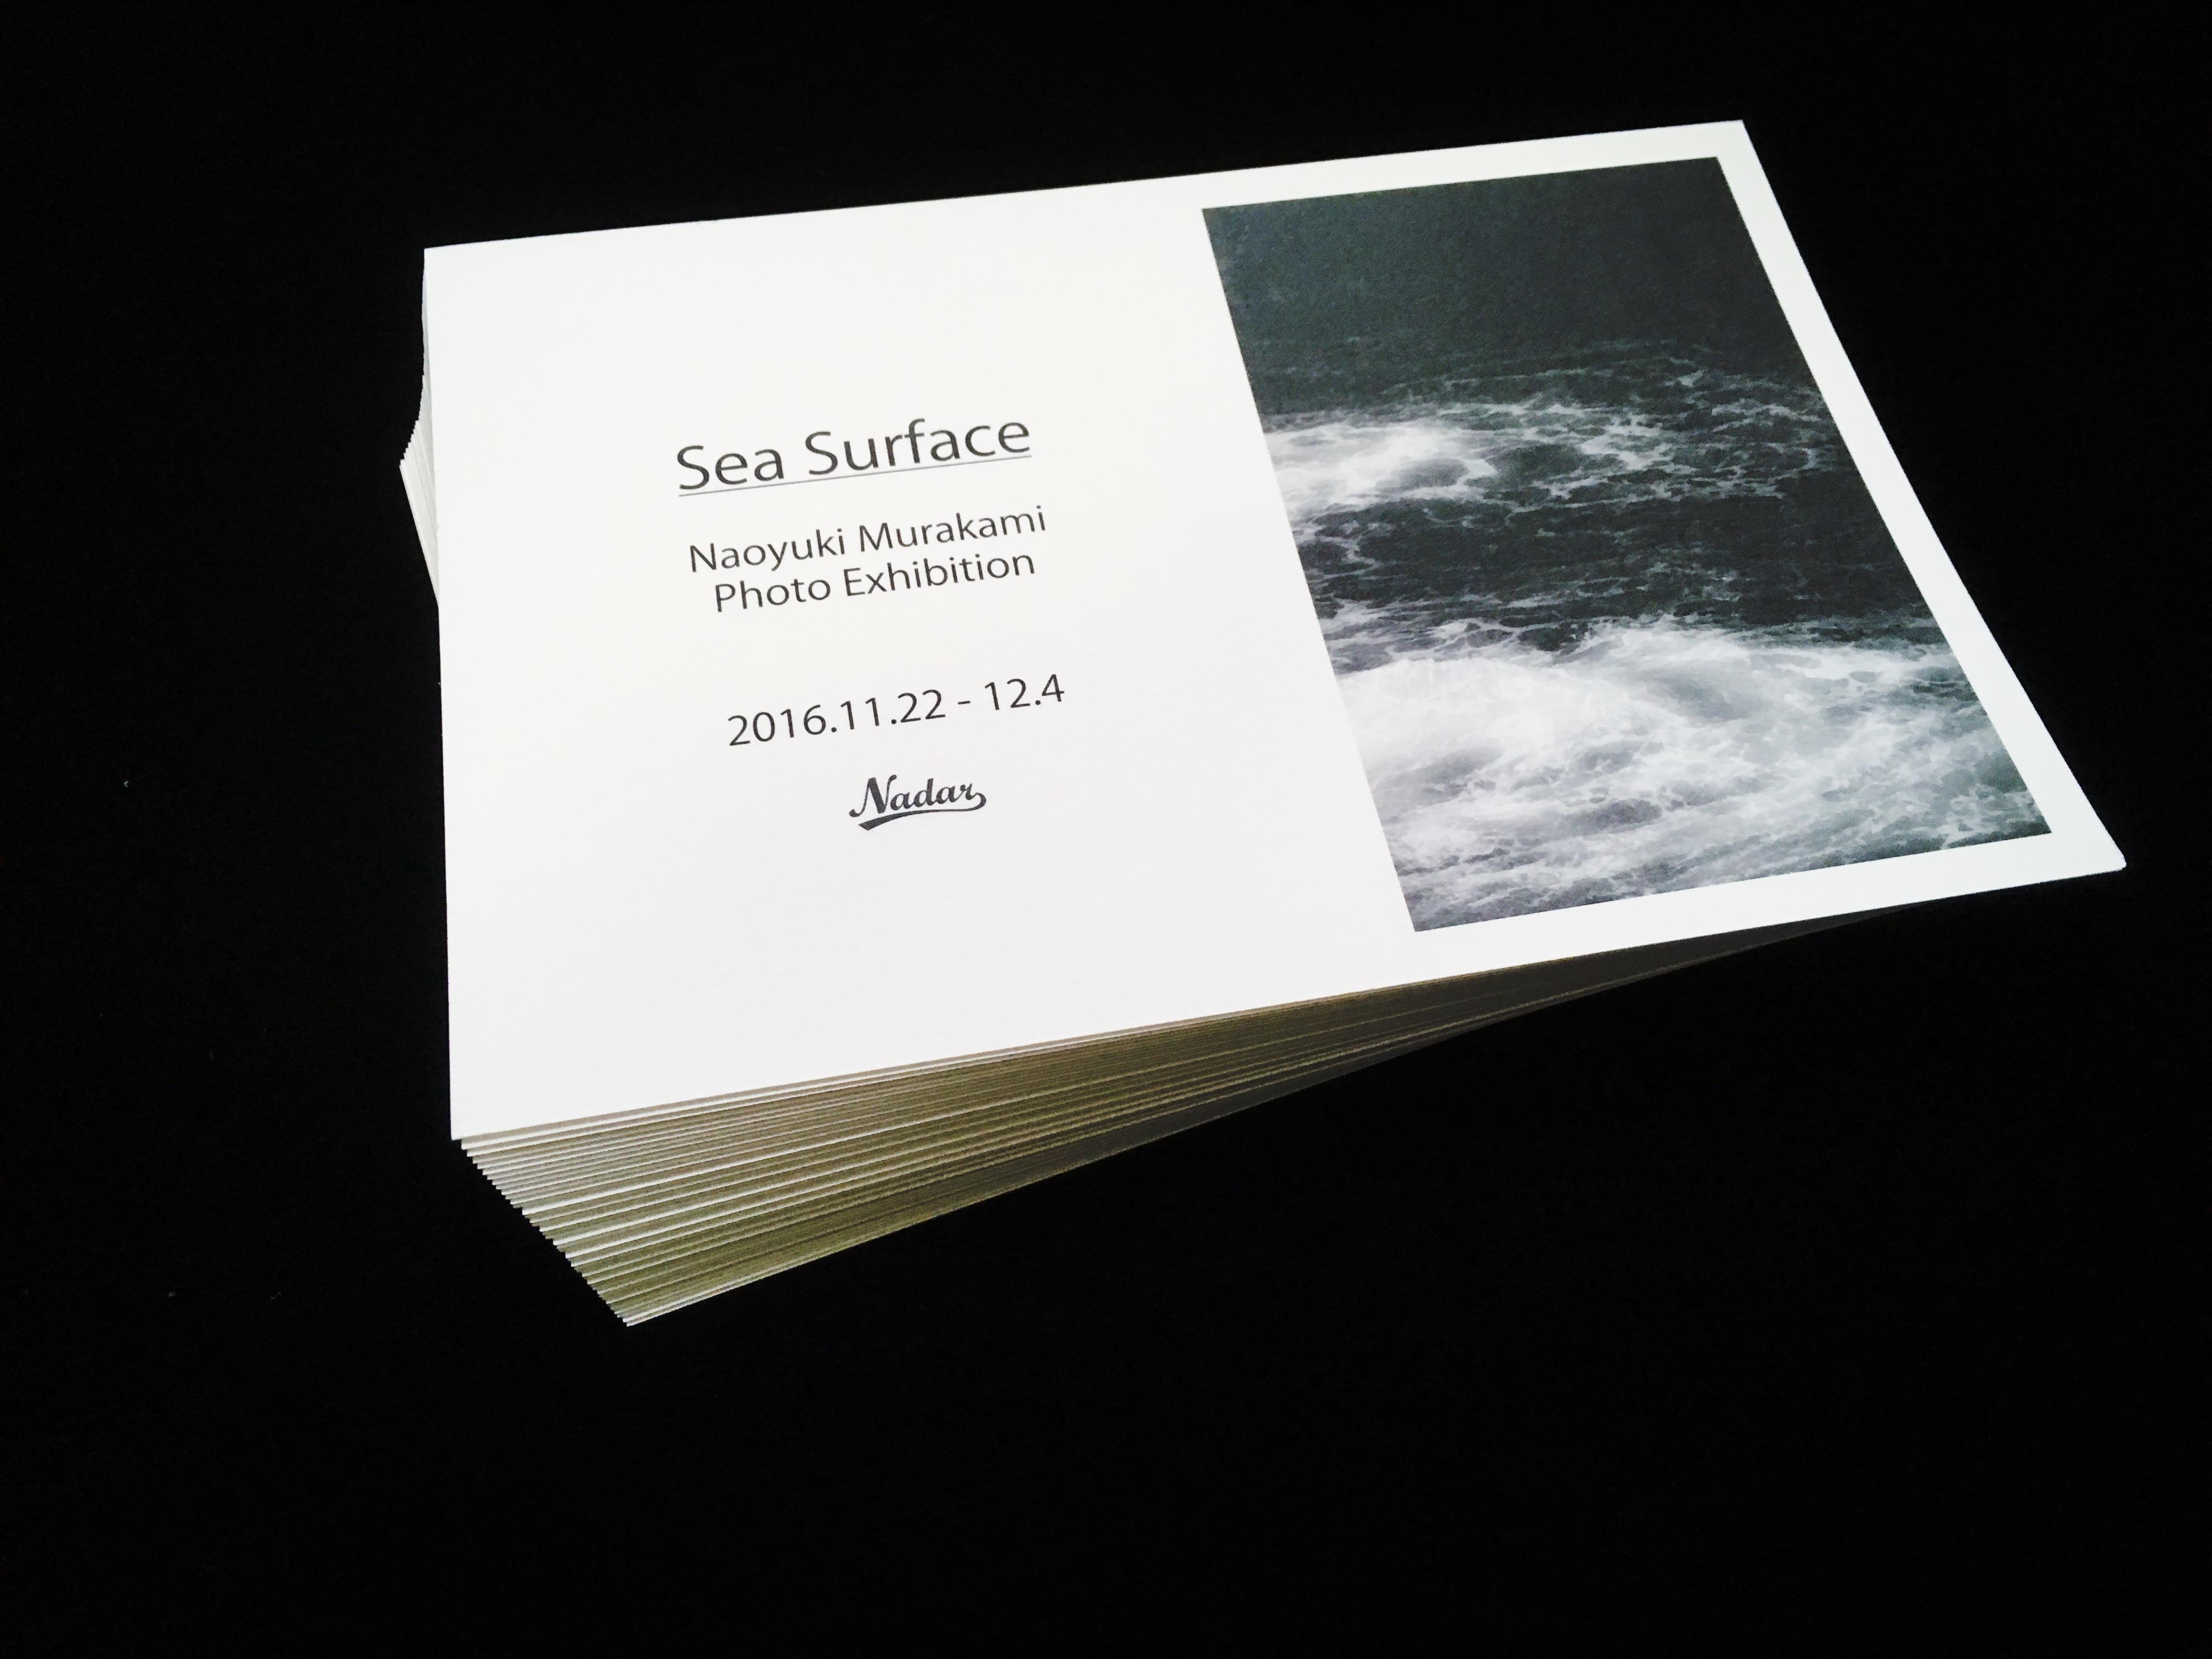 SeaSurface_information